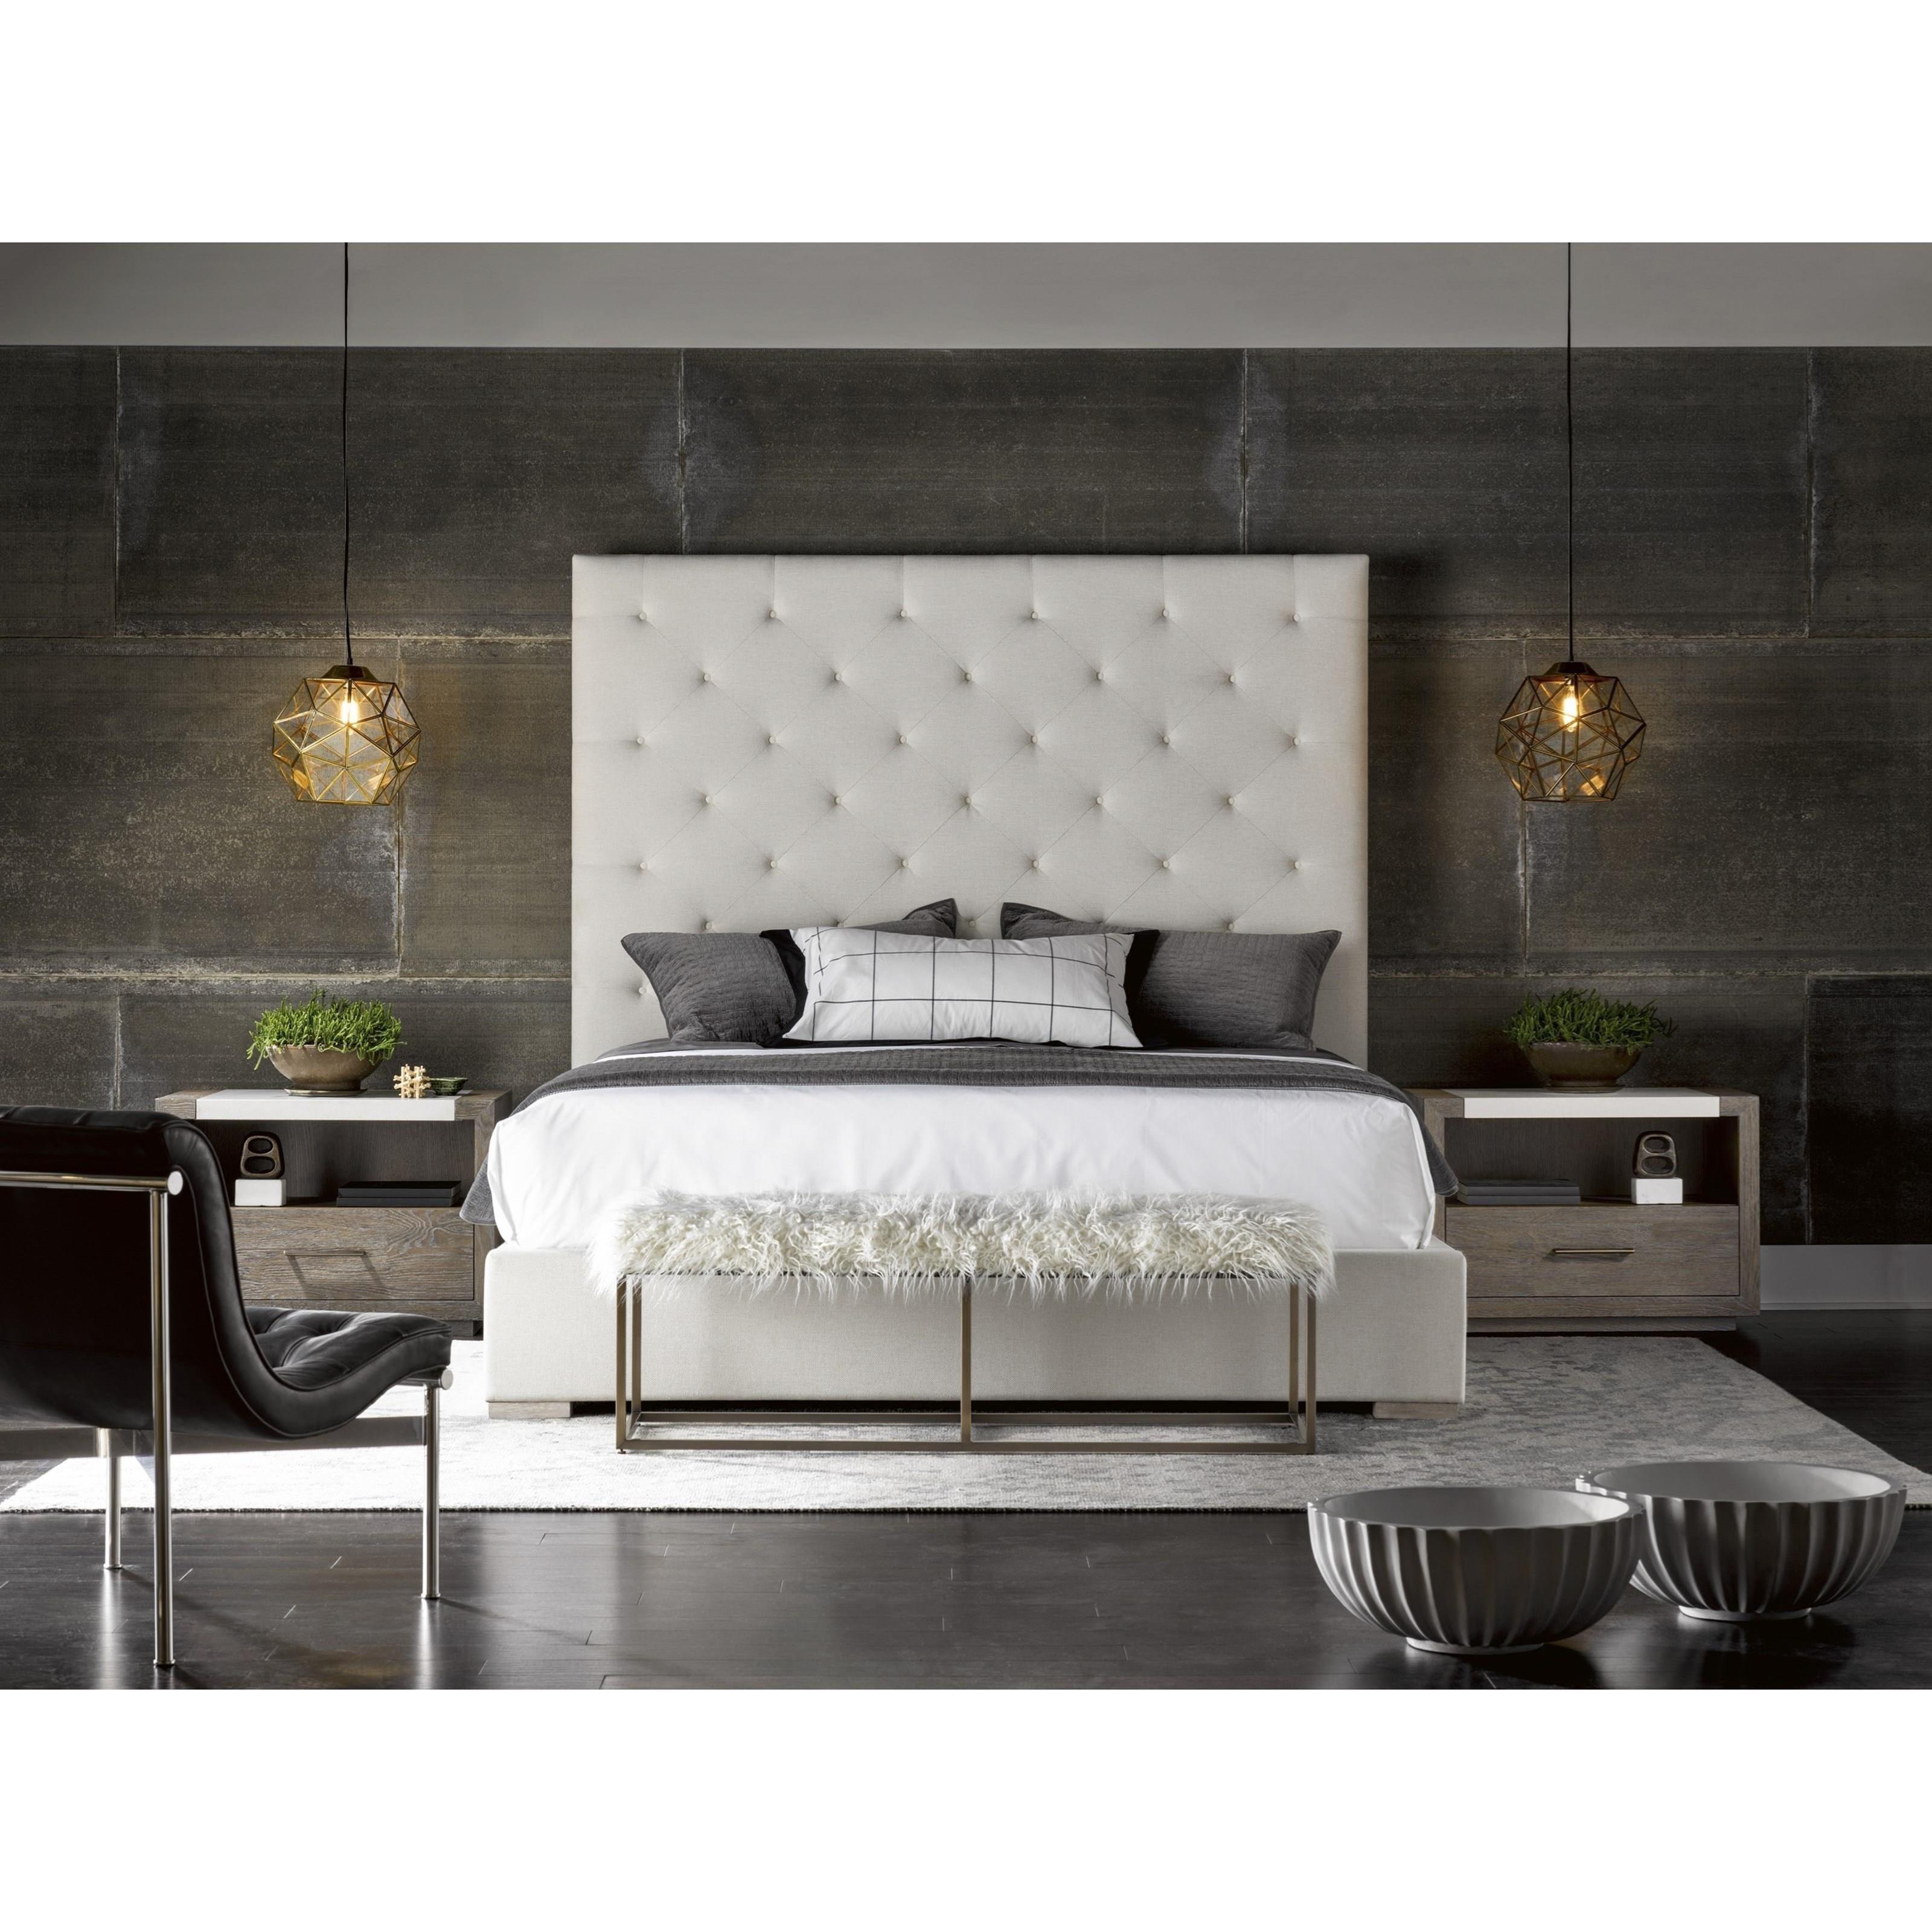 Universal Modern Brando Bed With Tufted Headboard